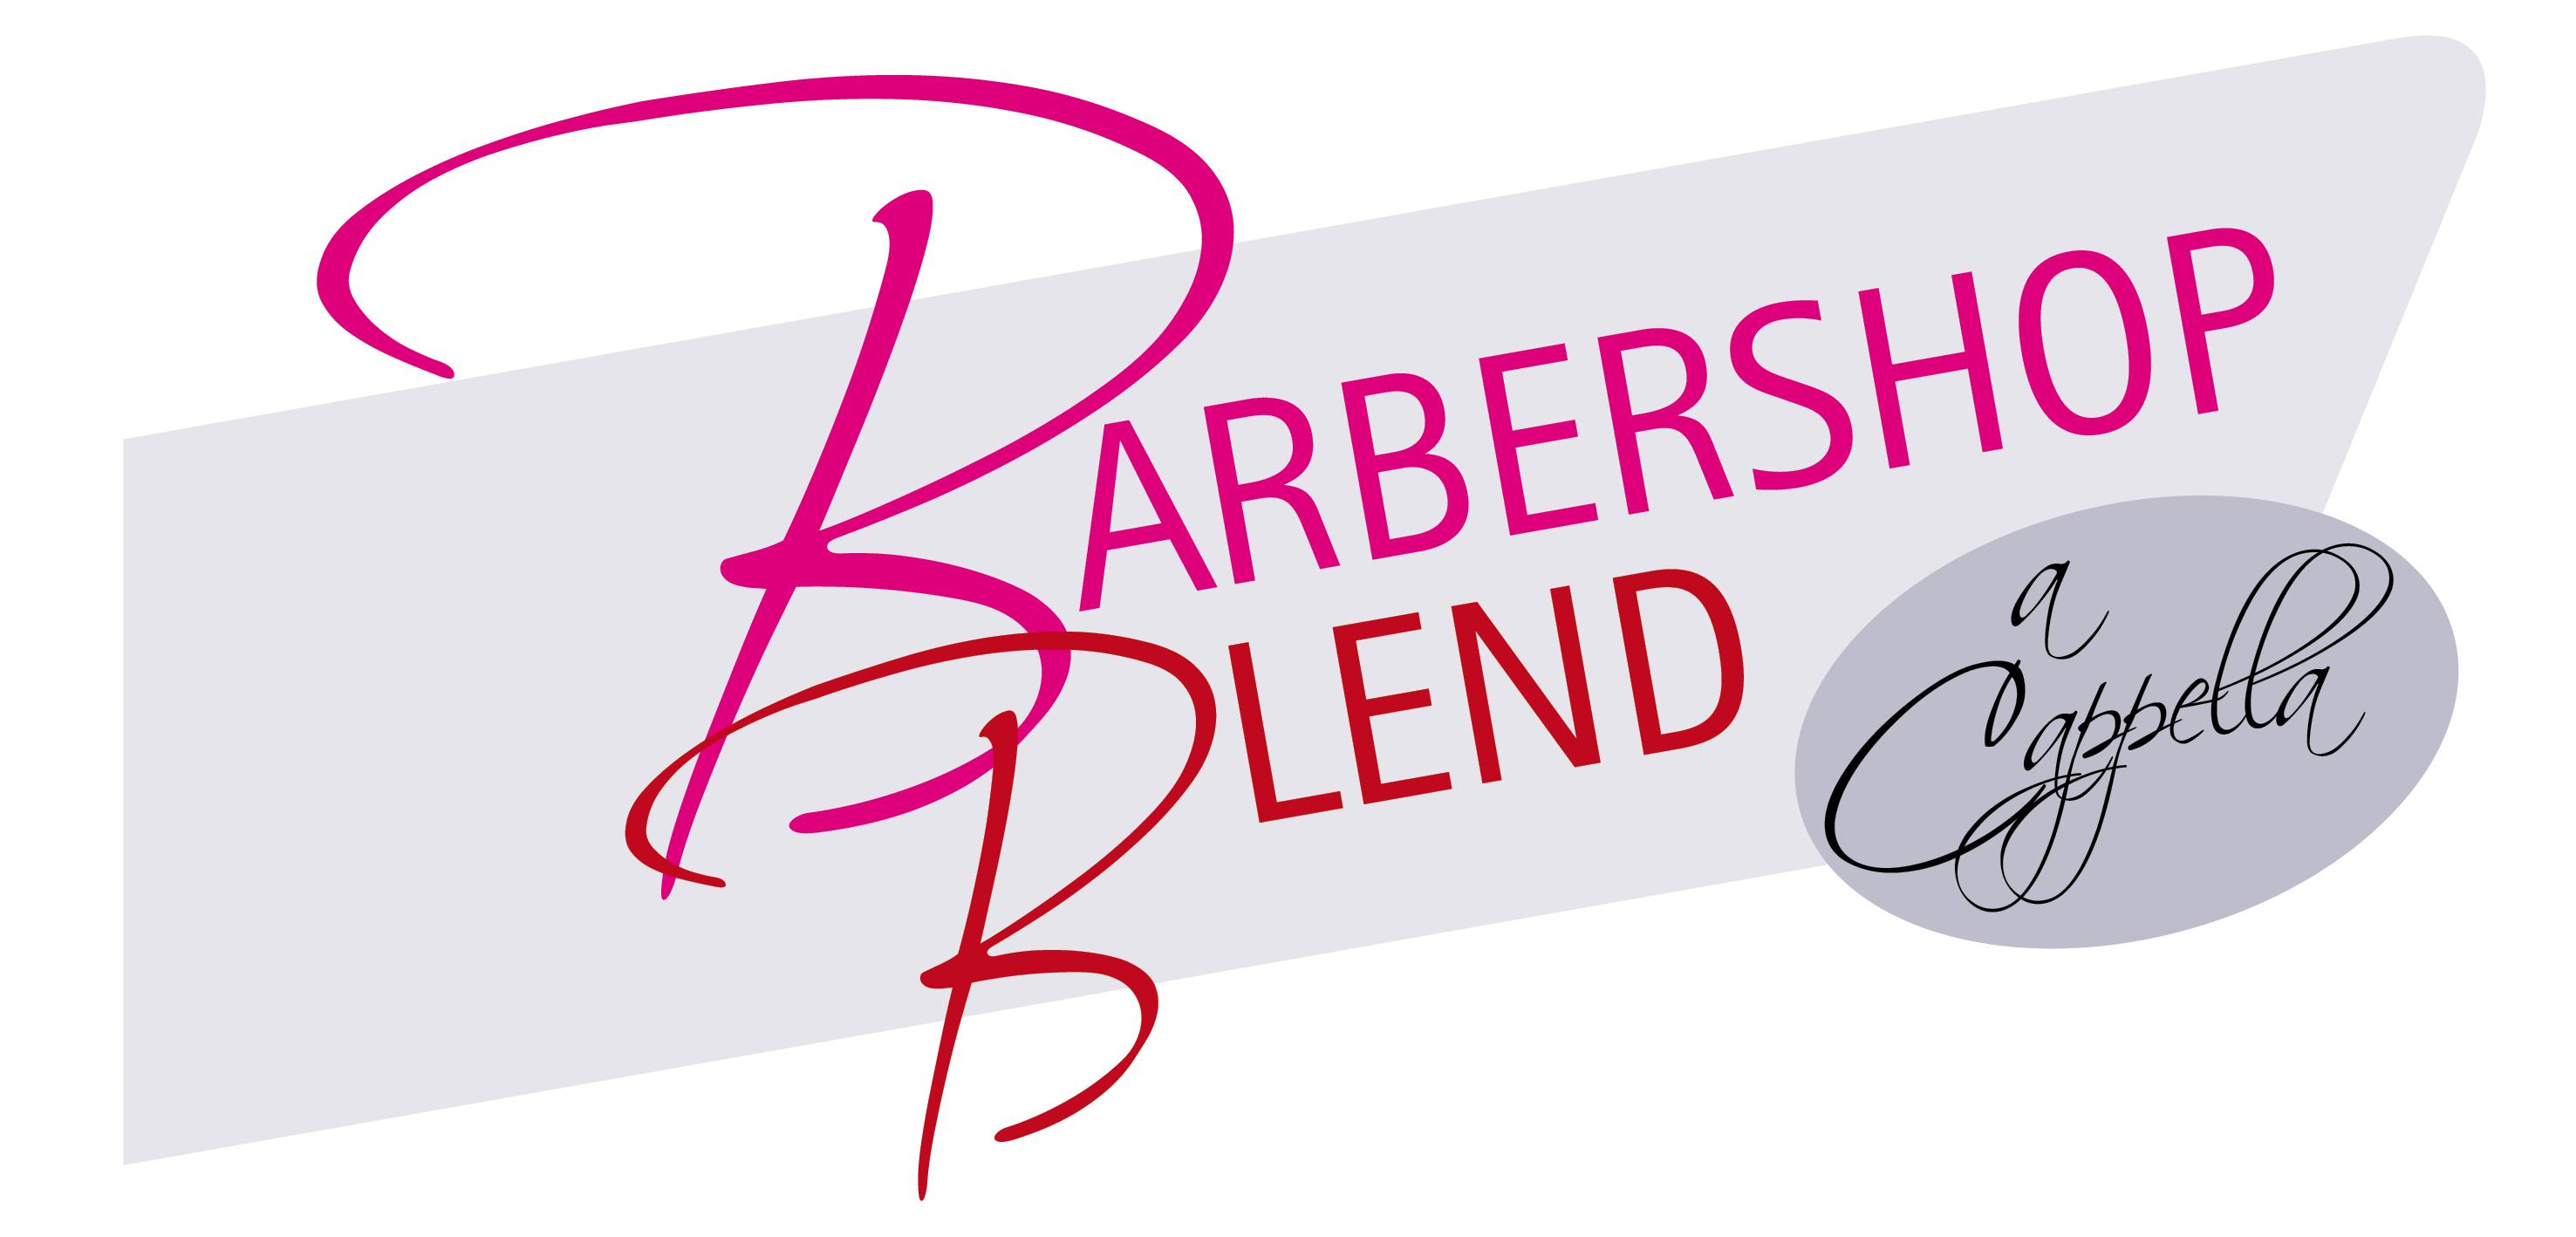 Barbershop Blend